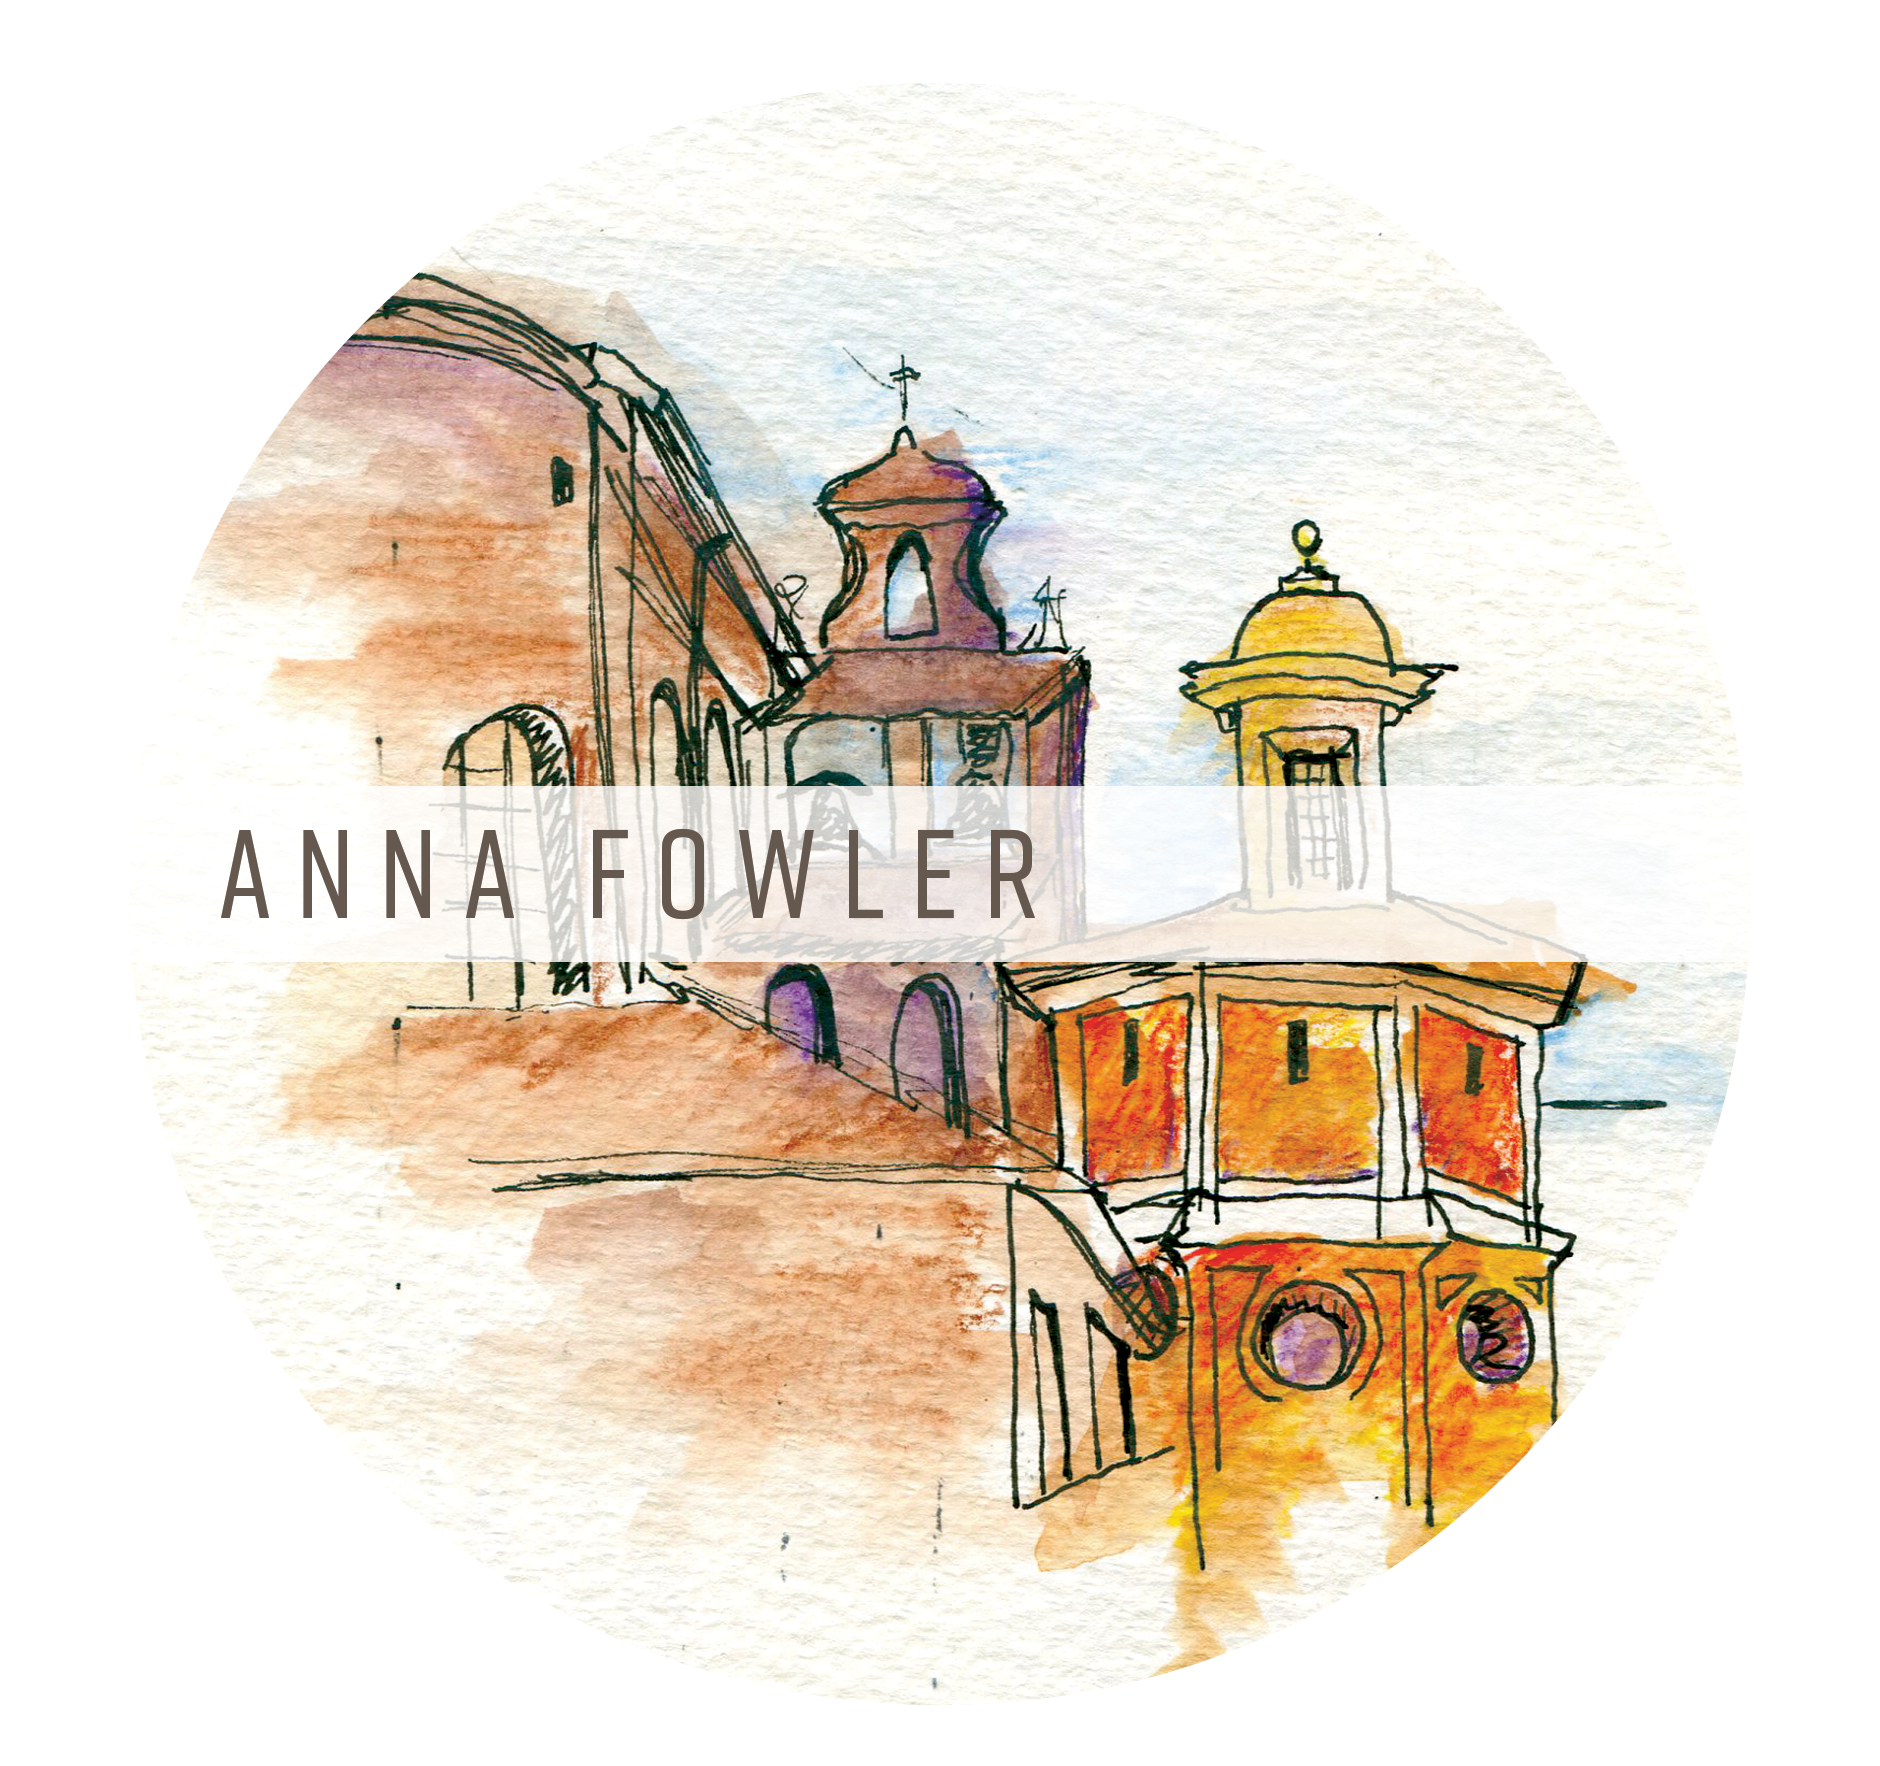 Anna Fowler